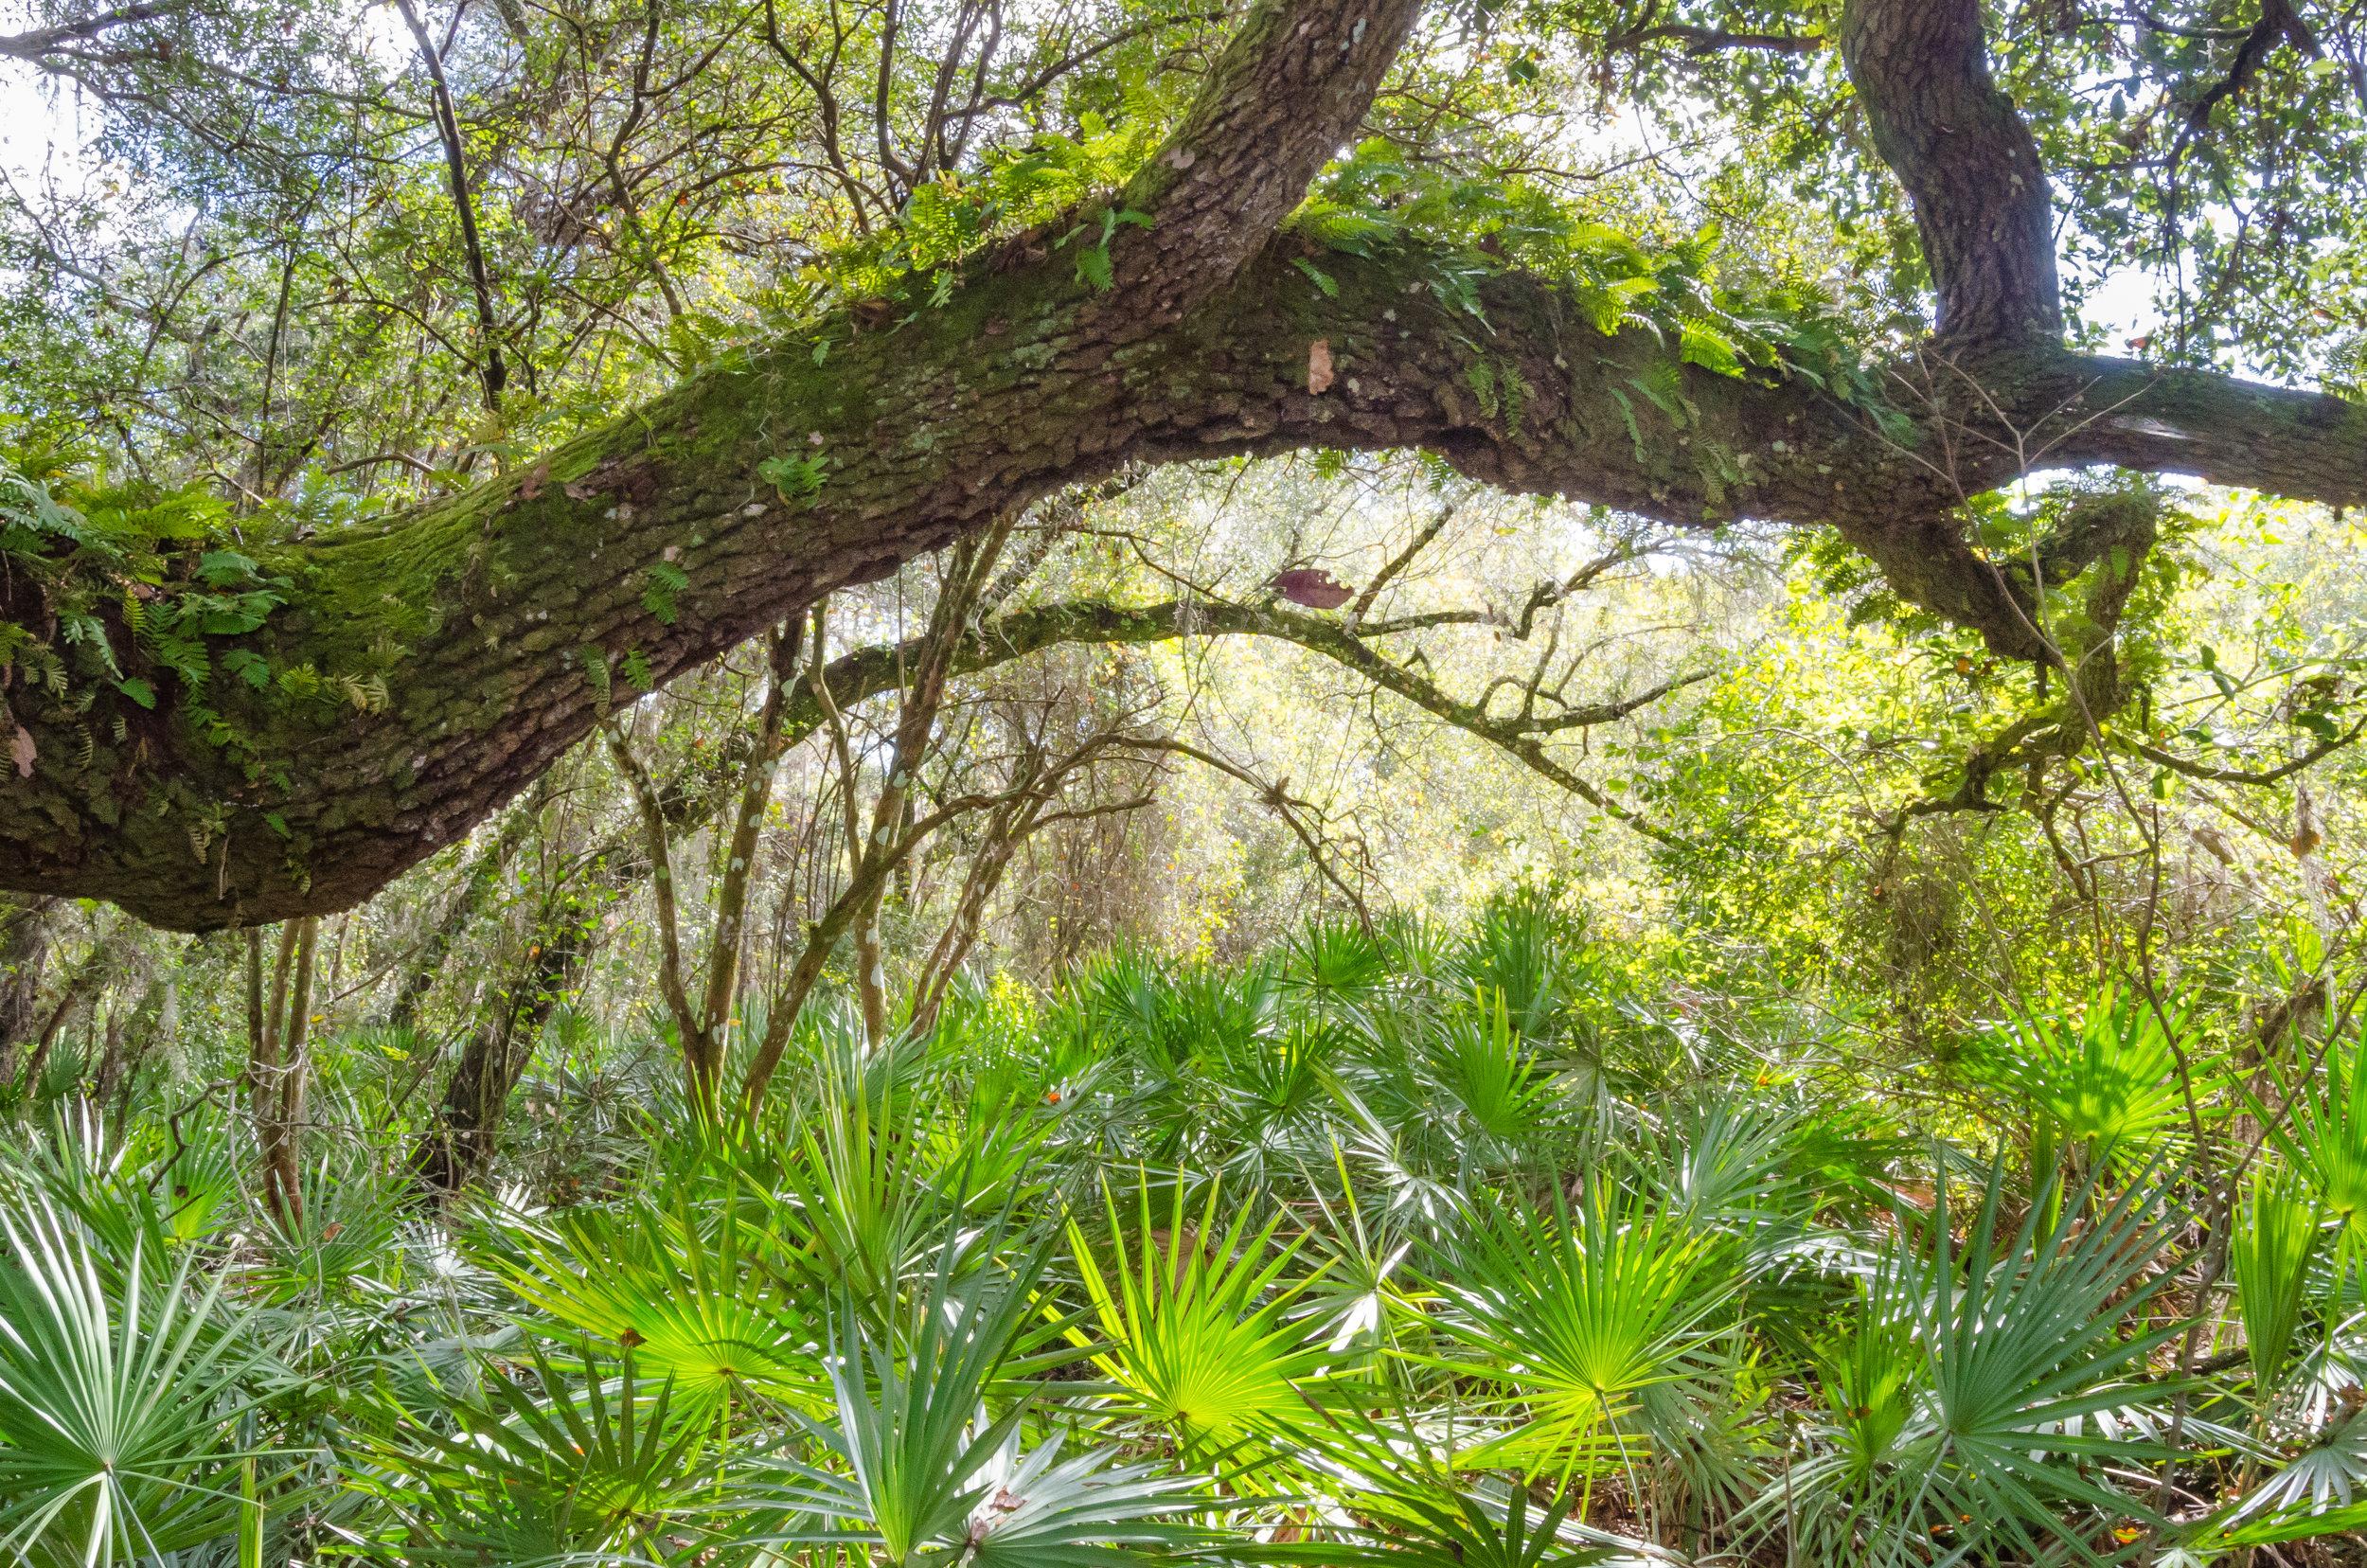 tree tunnel-palmettos-florida-lake griffin state park.jpg